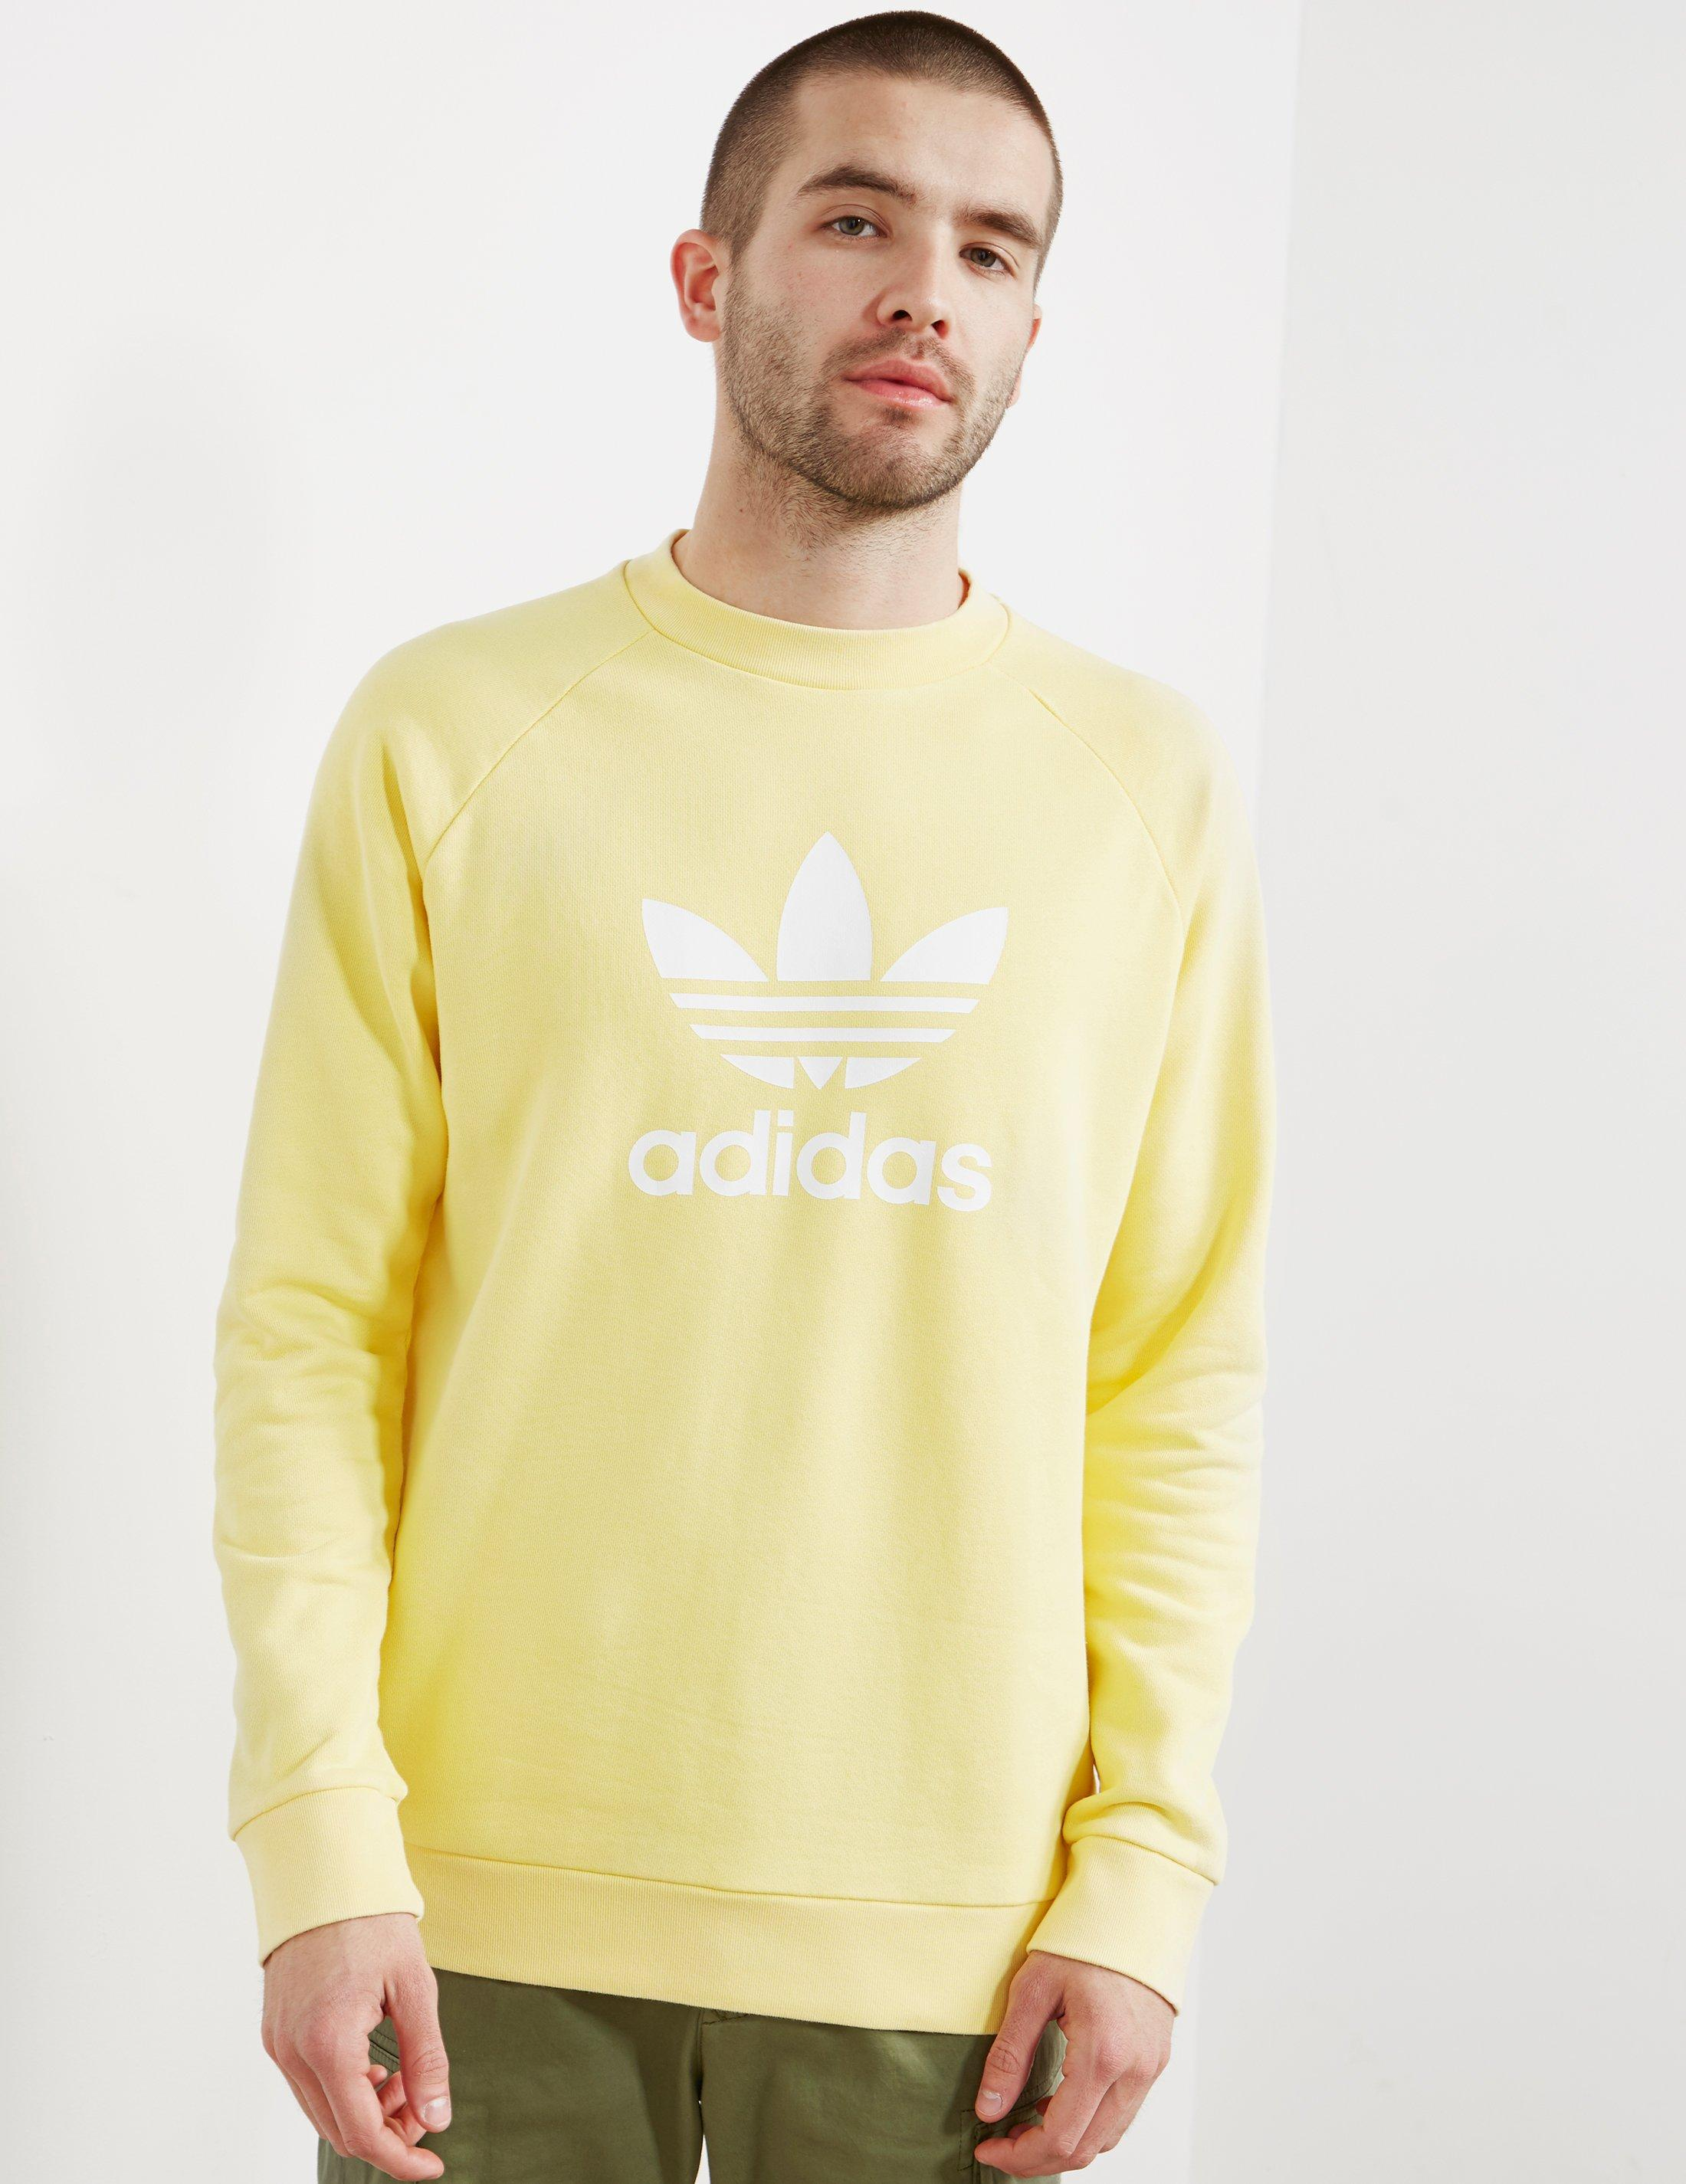 adidas Originals Cotton Mens Trefoil Crew Sweatshirt Yellow